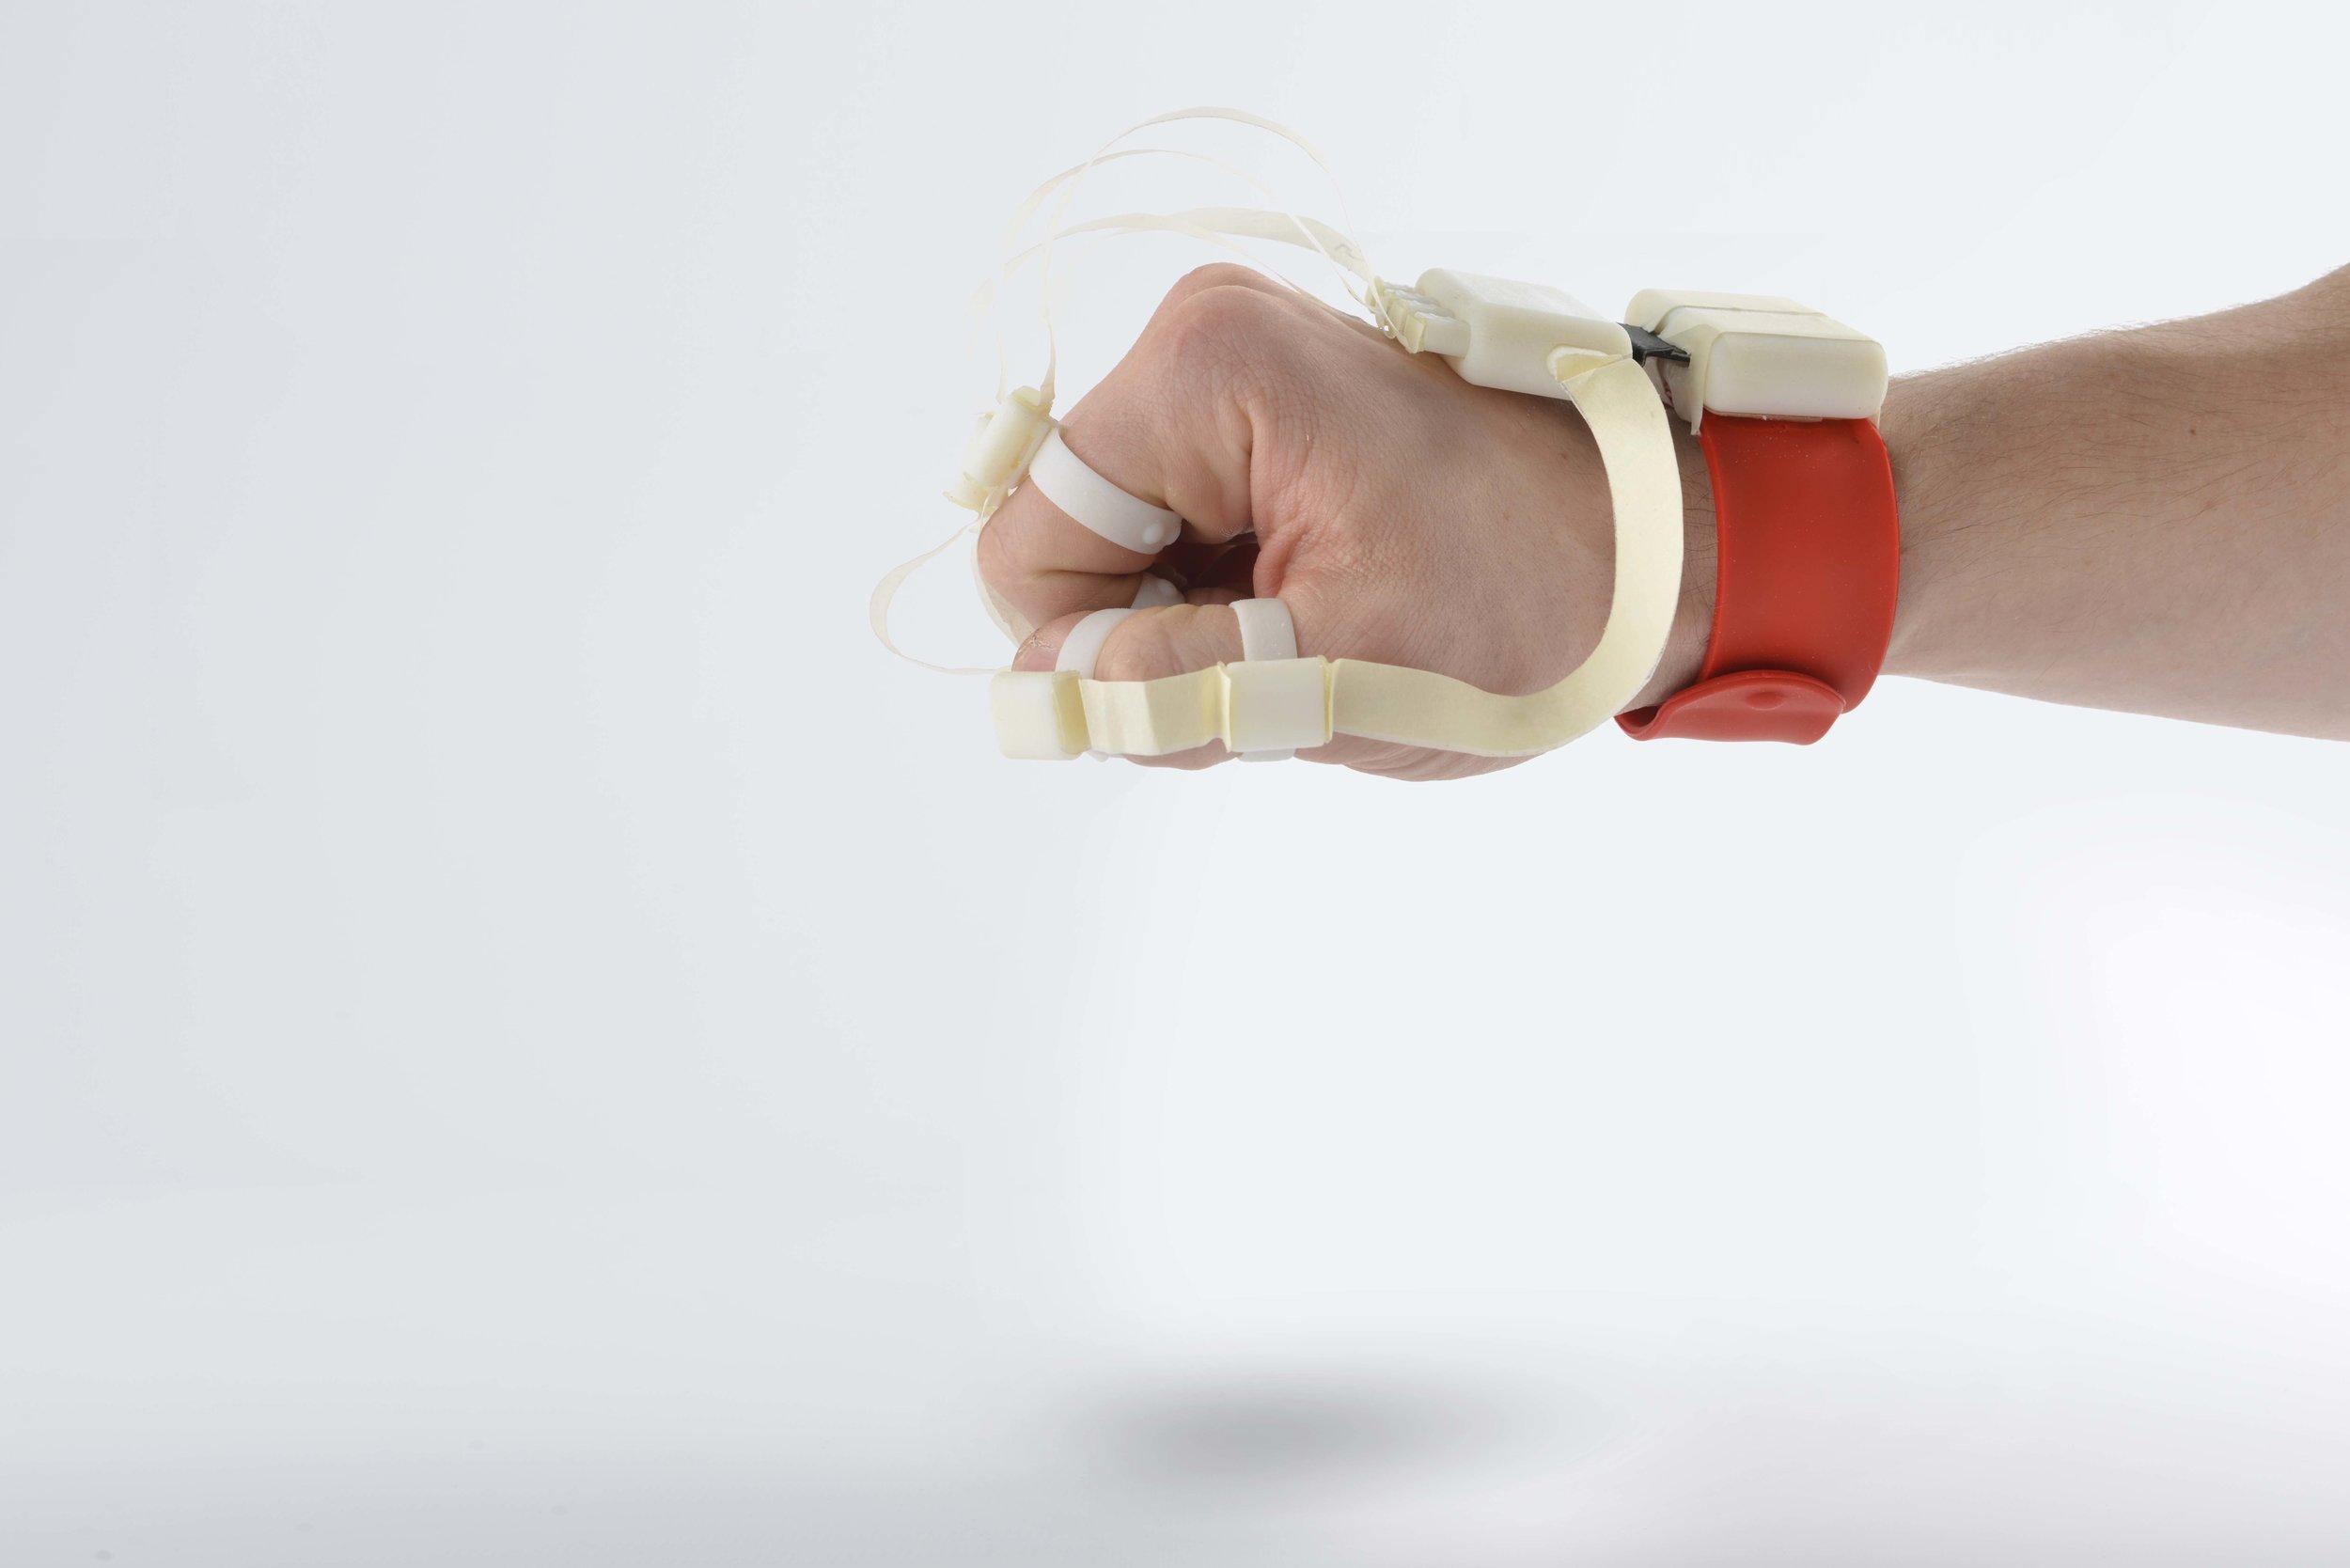 Hand flexibility rig_v02.jpg